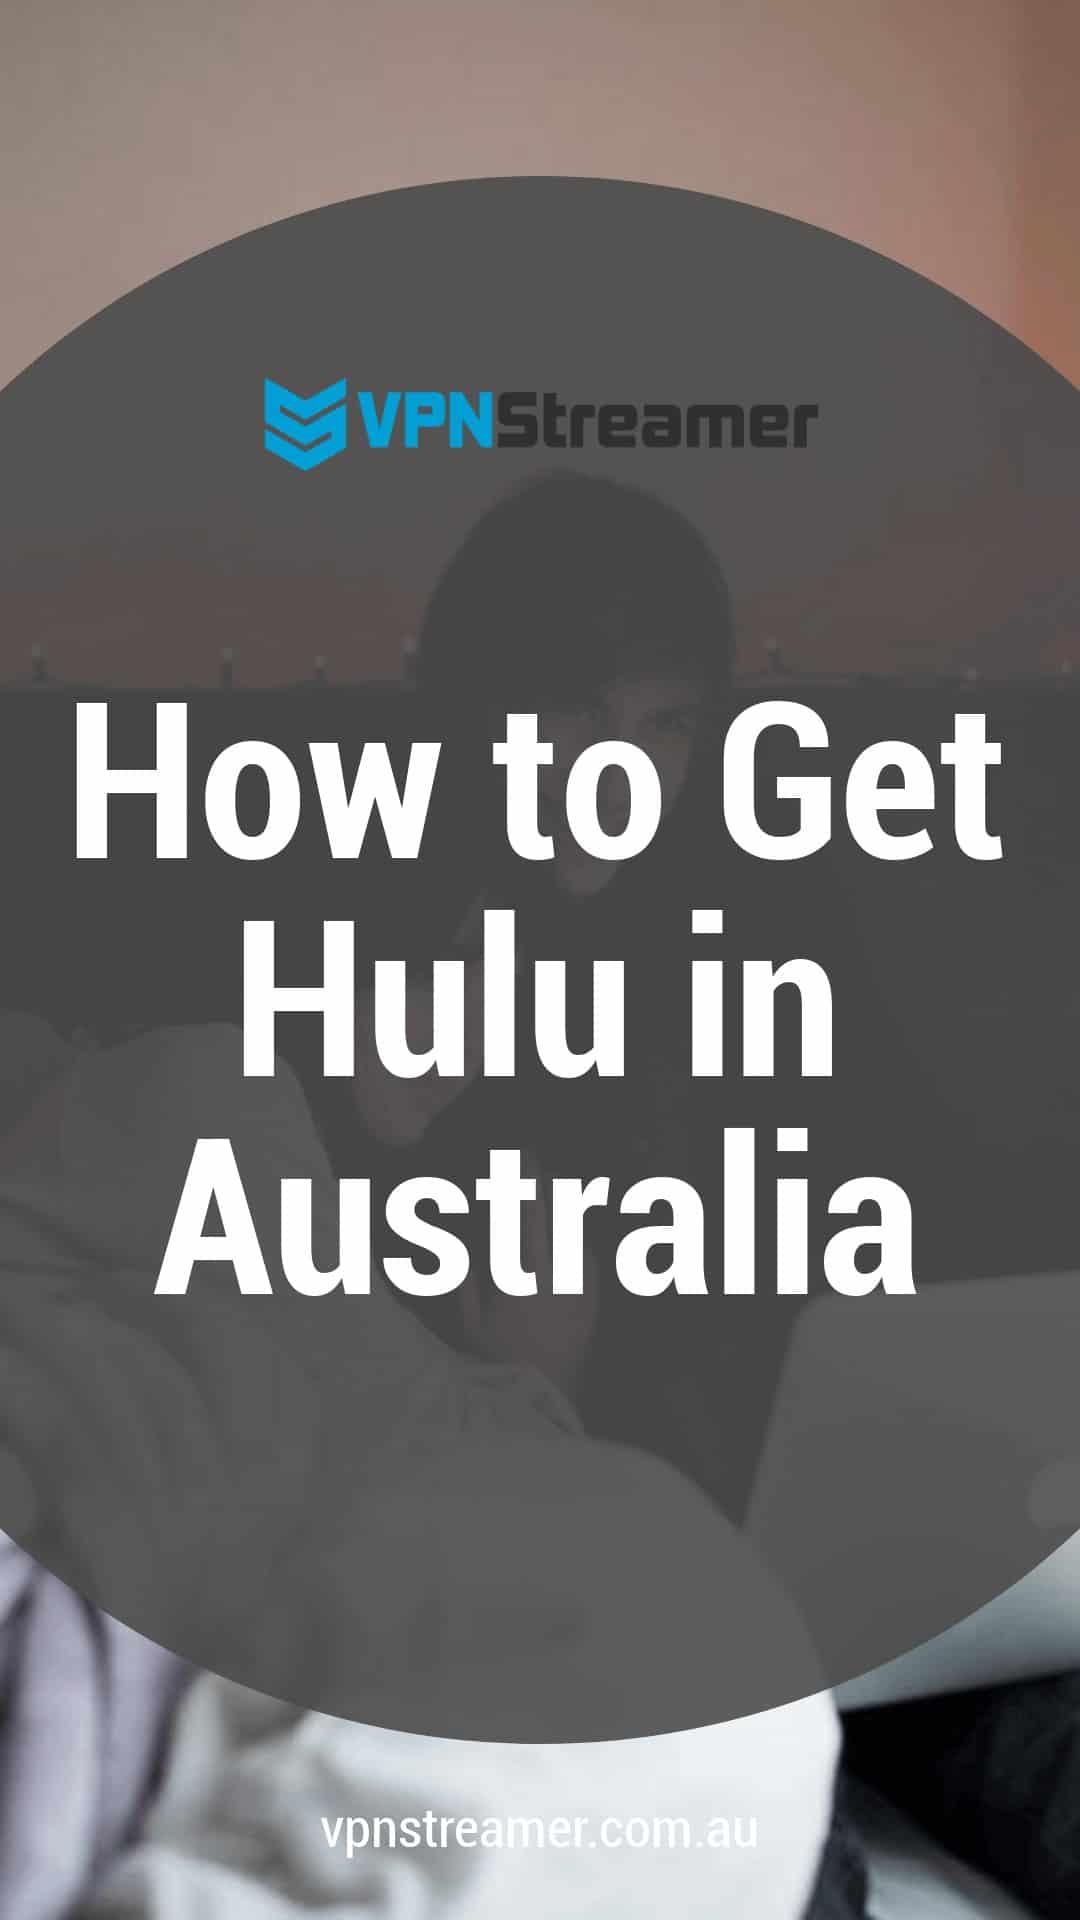 How to Get Hulu in Australia